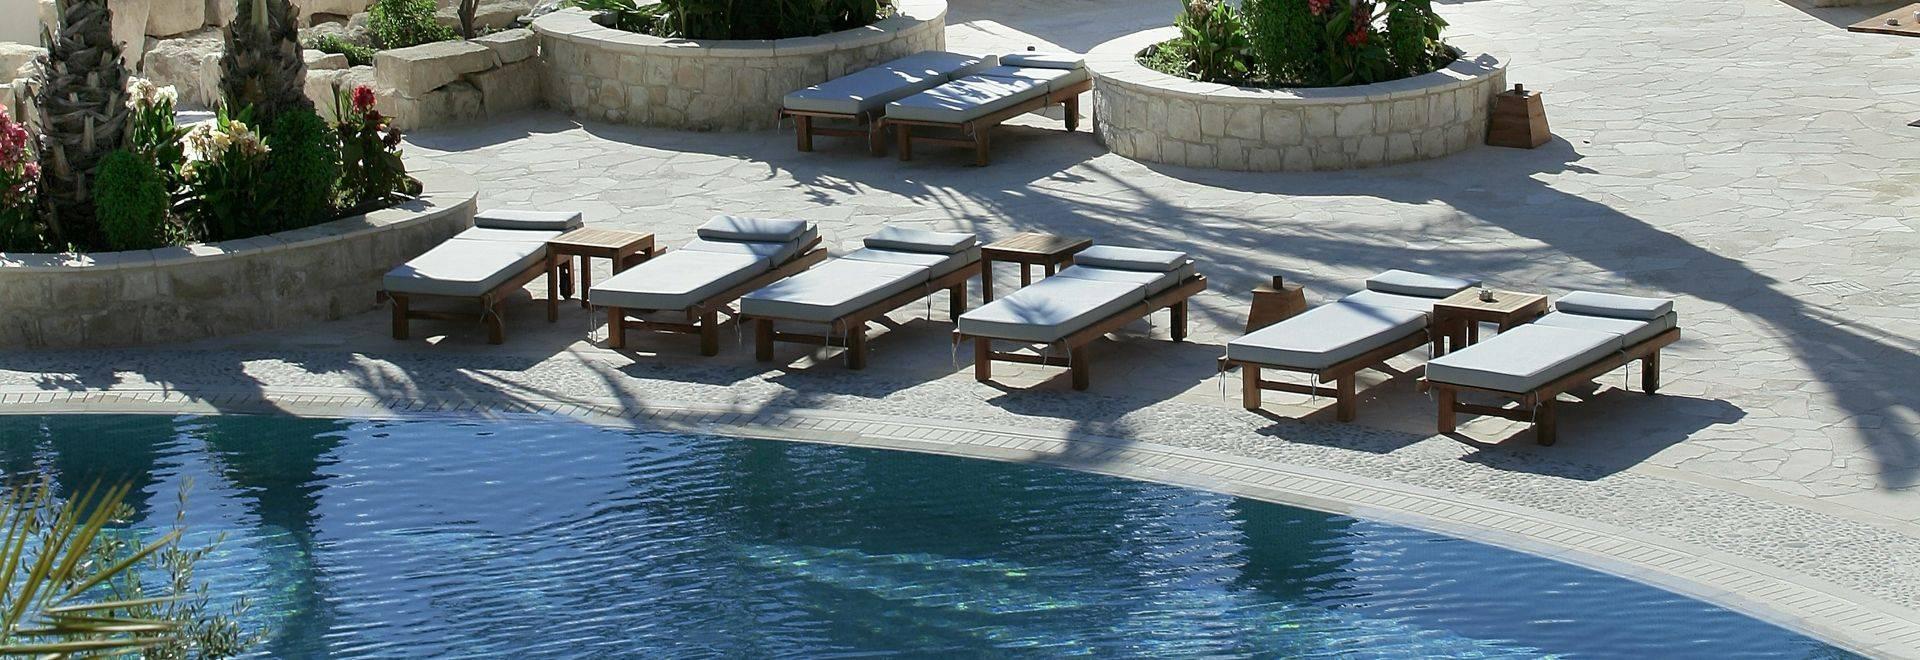 Ayii-Anargyri-pool-view.JPG